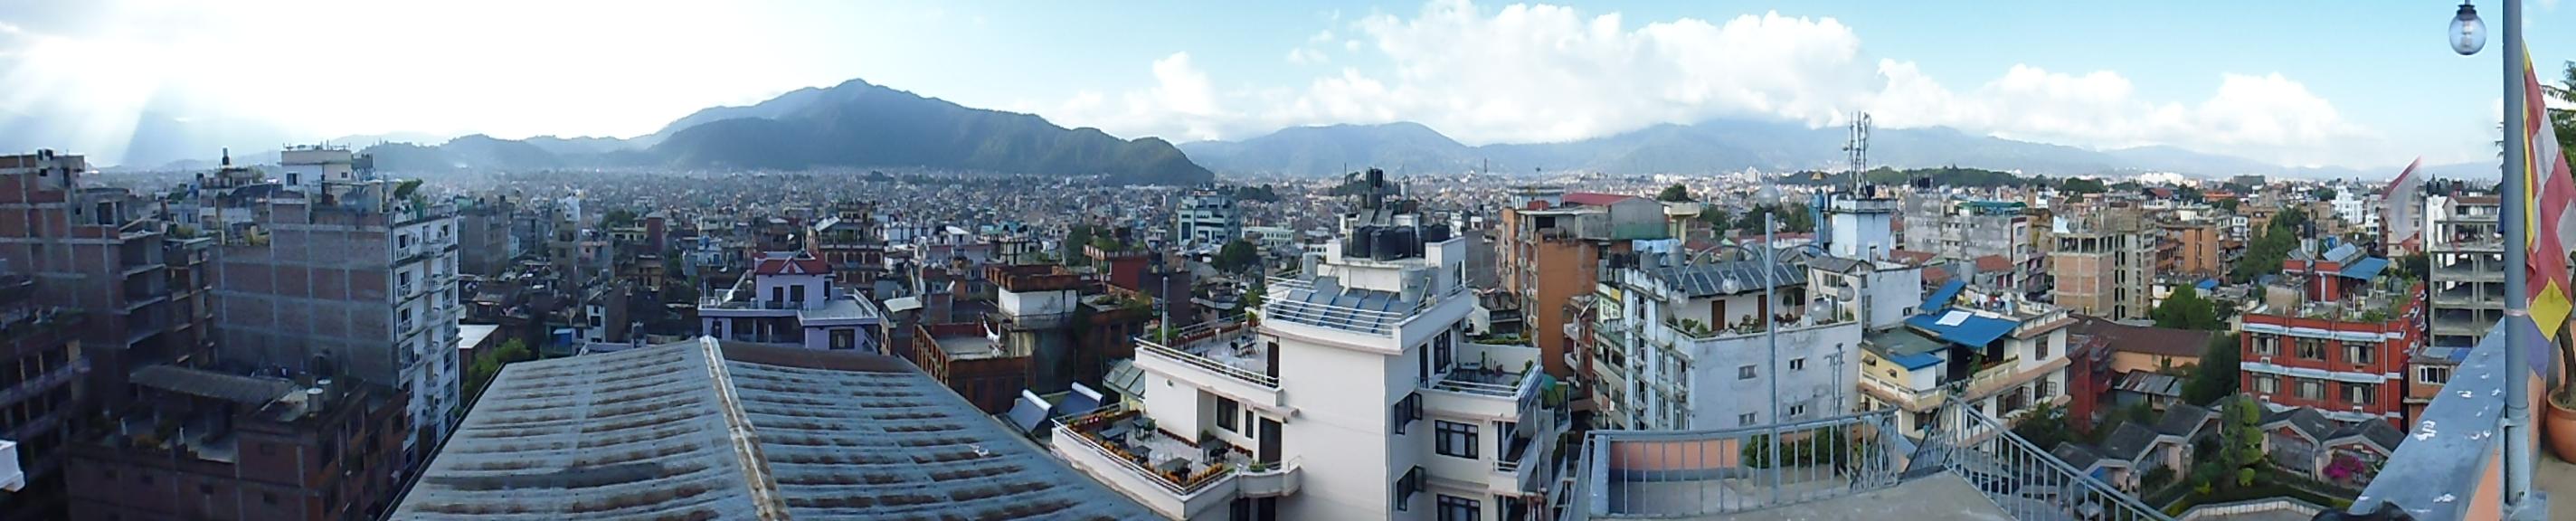 Portrait View of the Kathmandu City